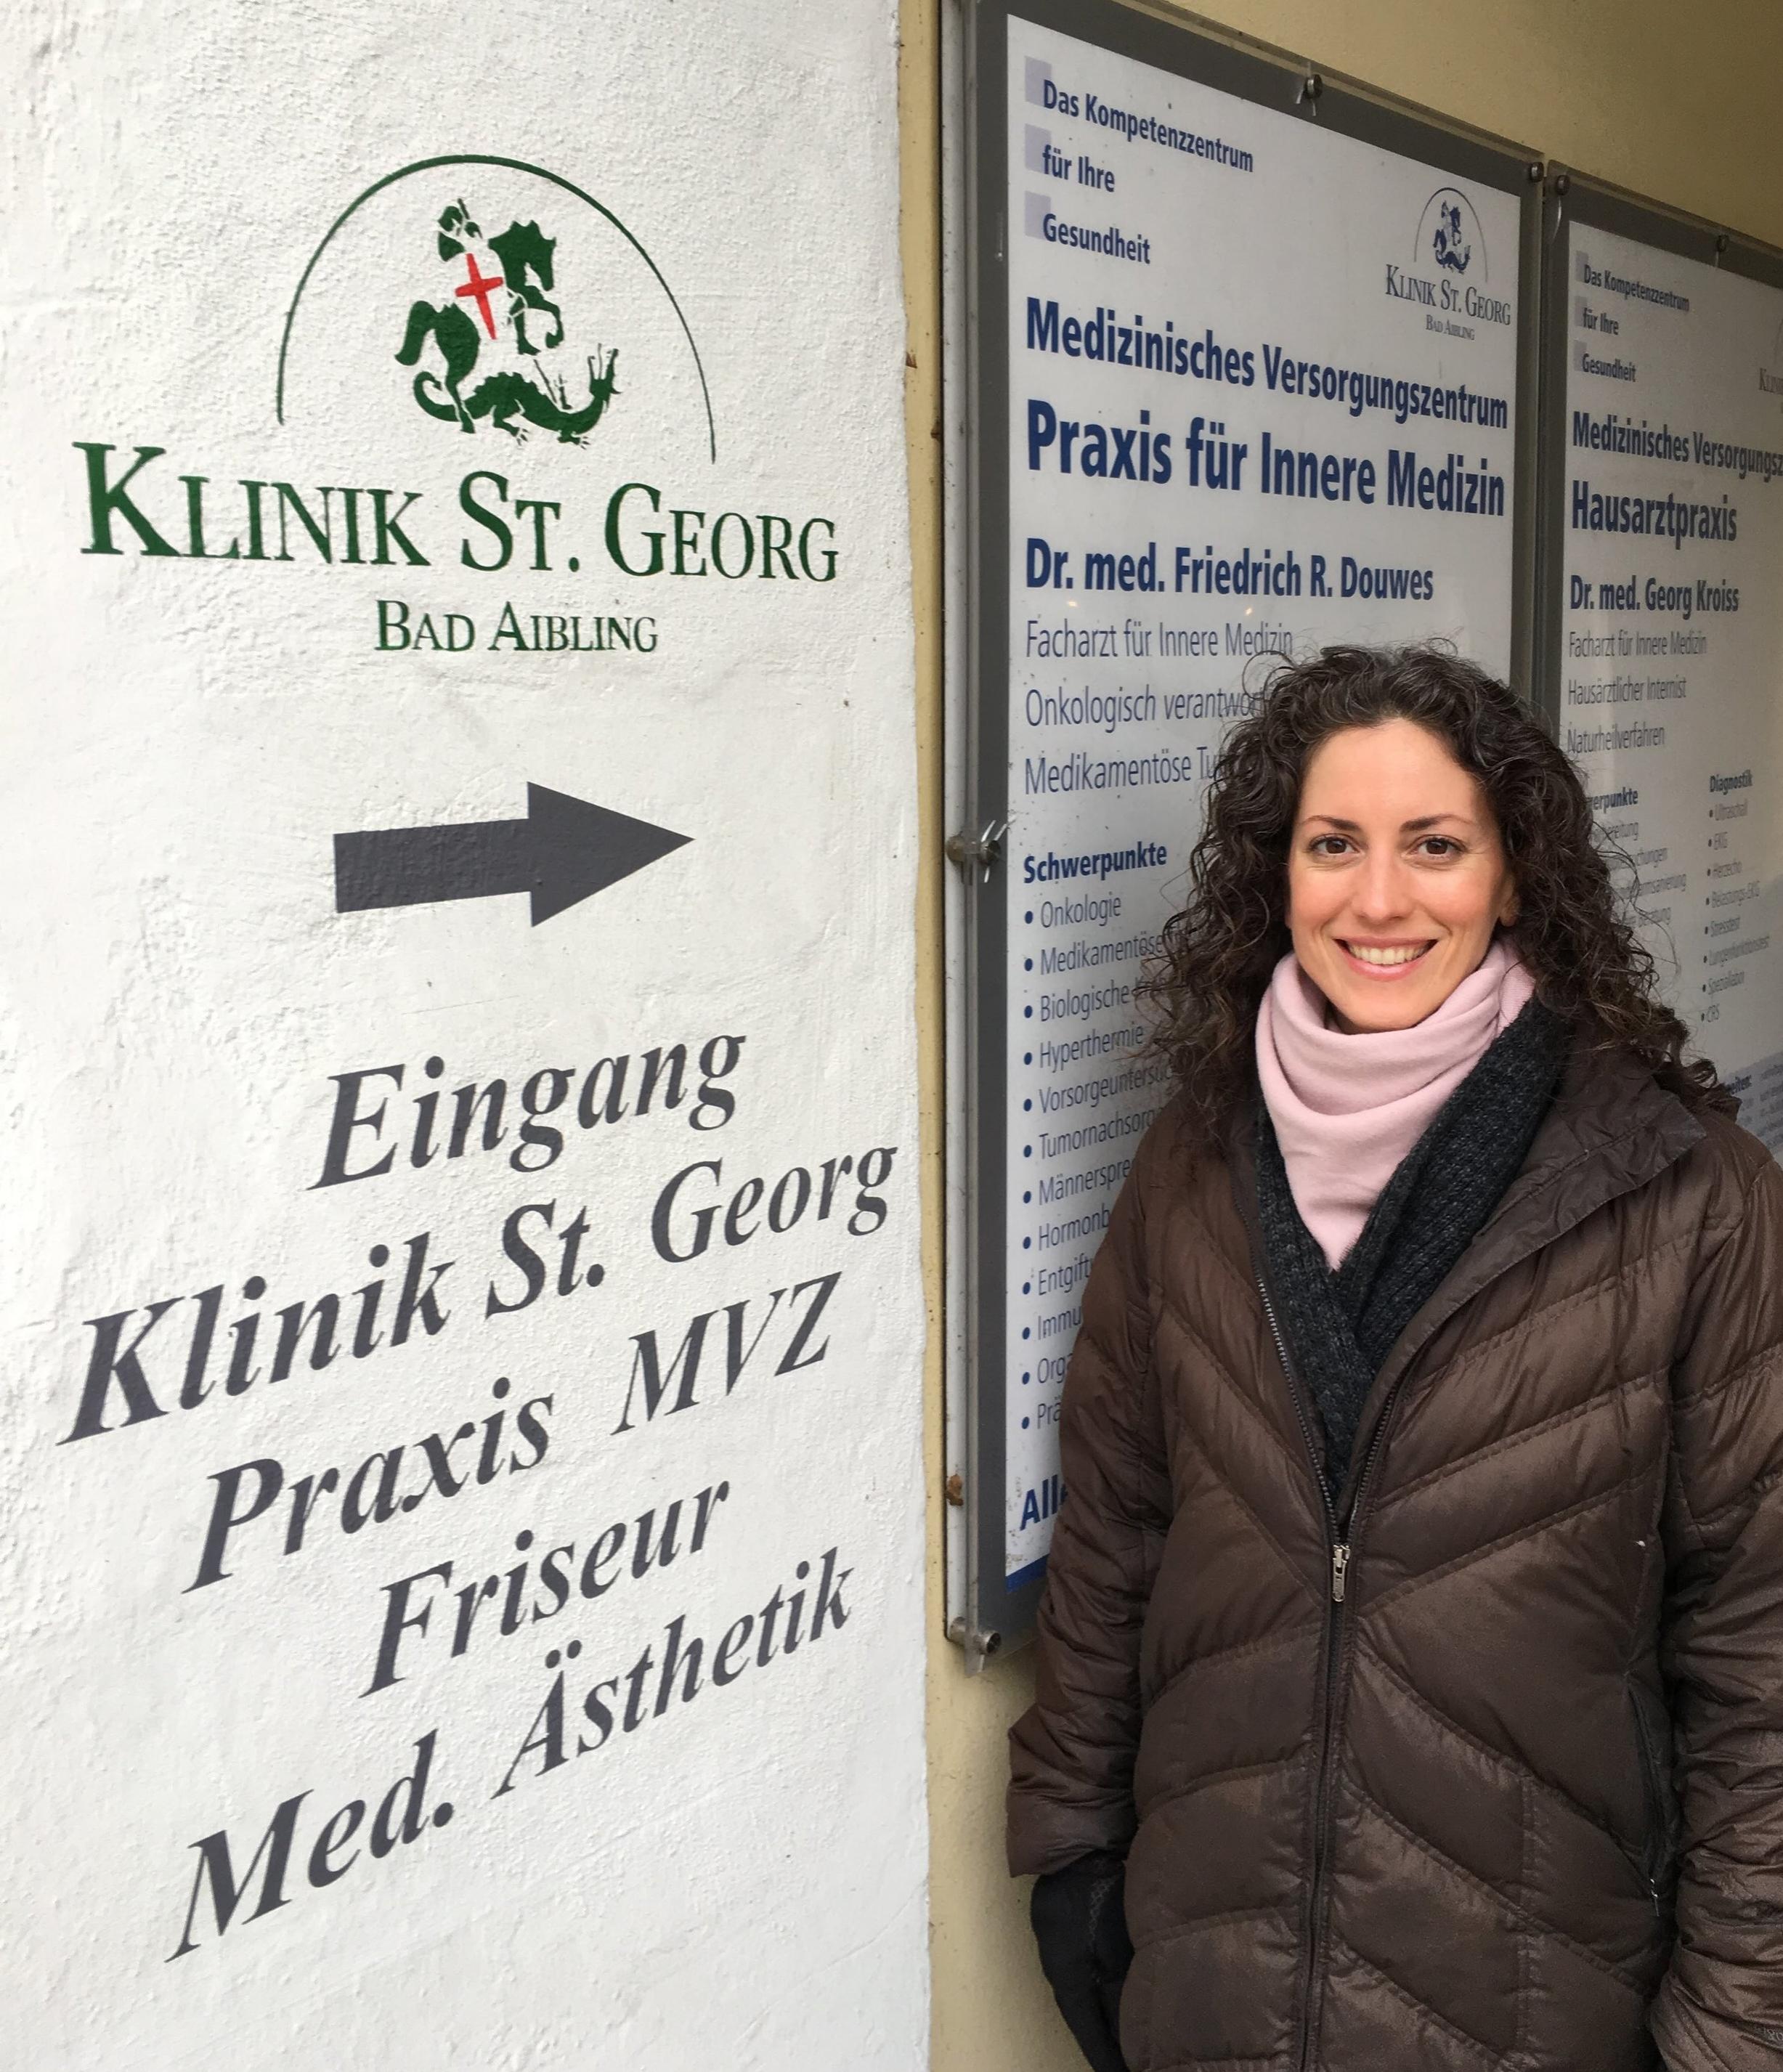 Visiting German Cancer Clinics Klinik St. Georg